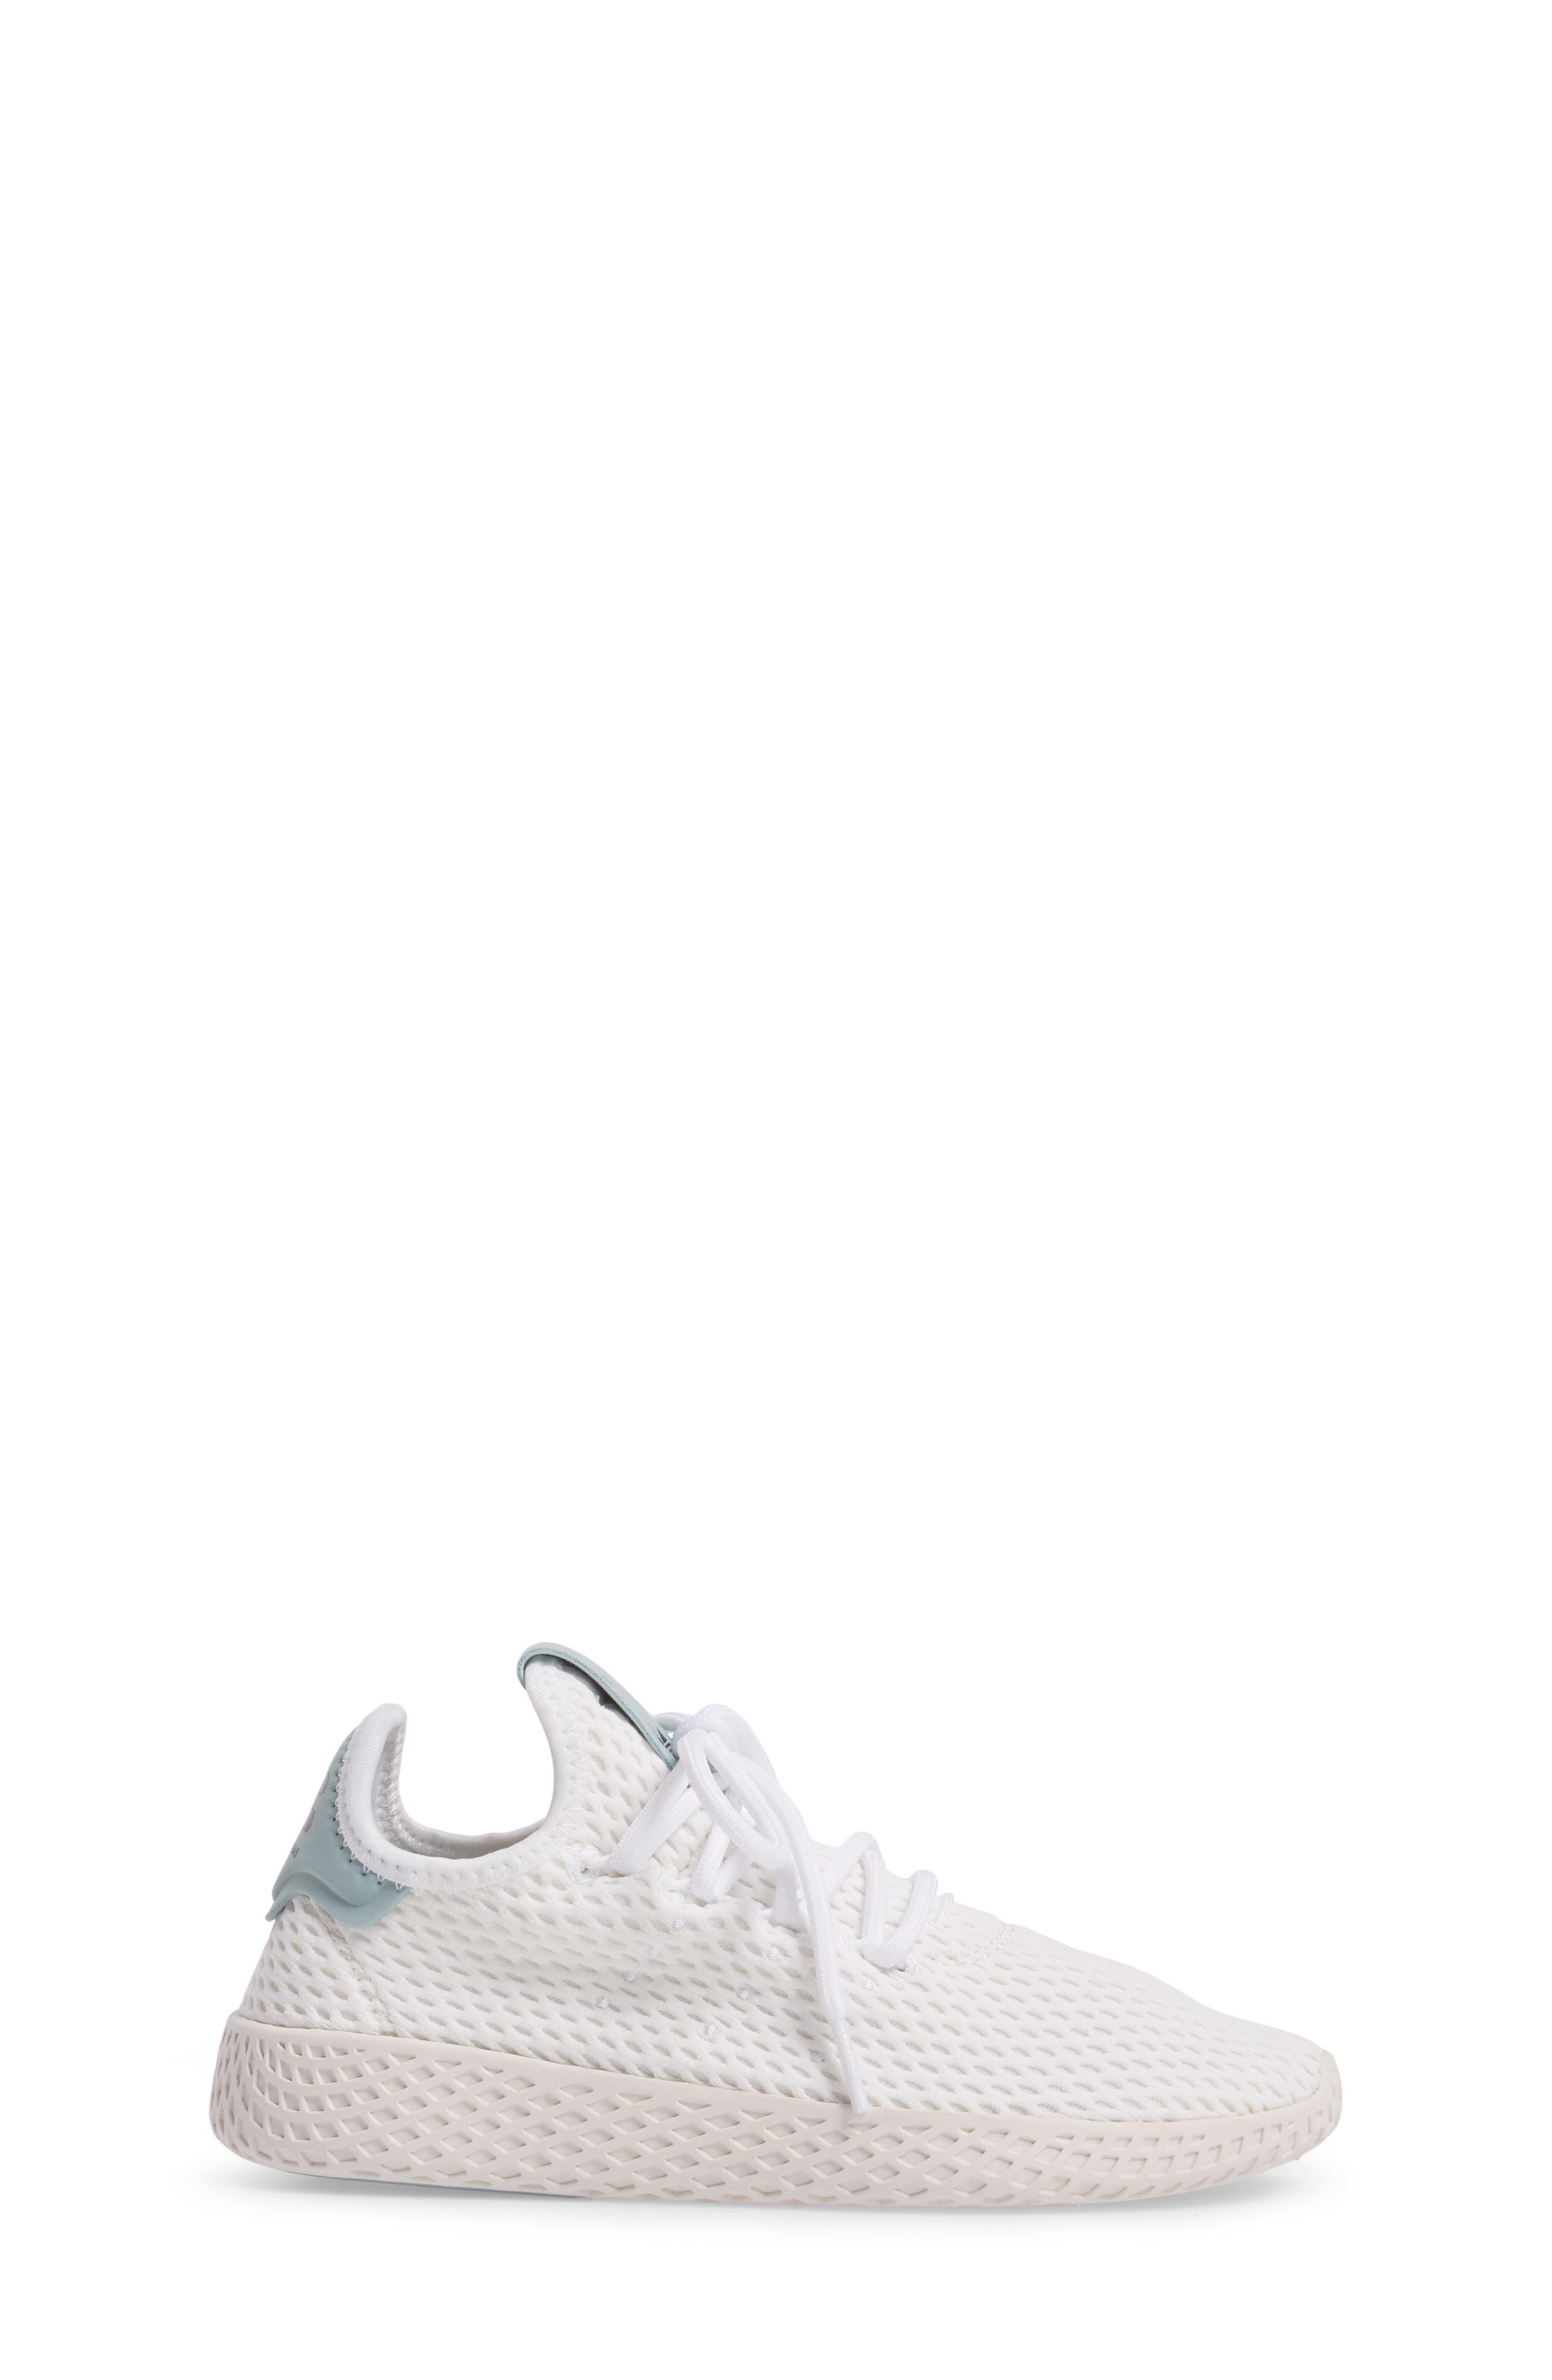 Originals x Pharrell Williams The Summers Mesh Sneaker,                             Alternate thumbnail 8, color,